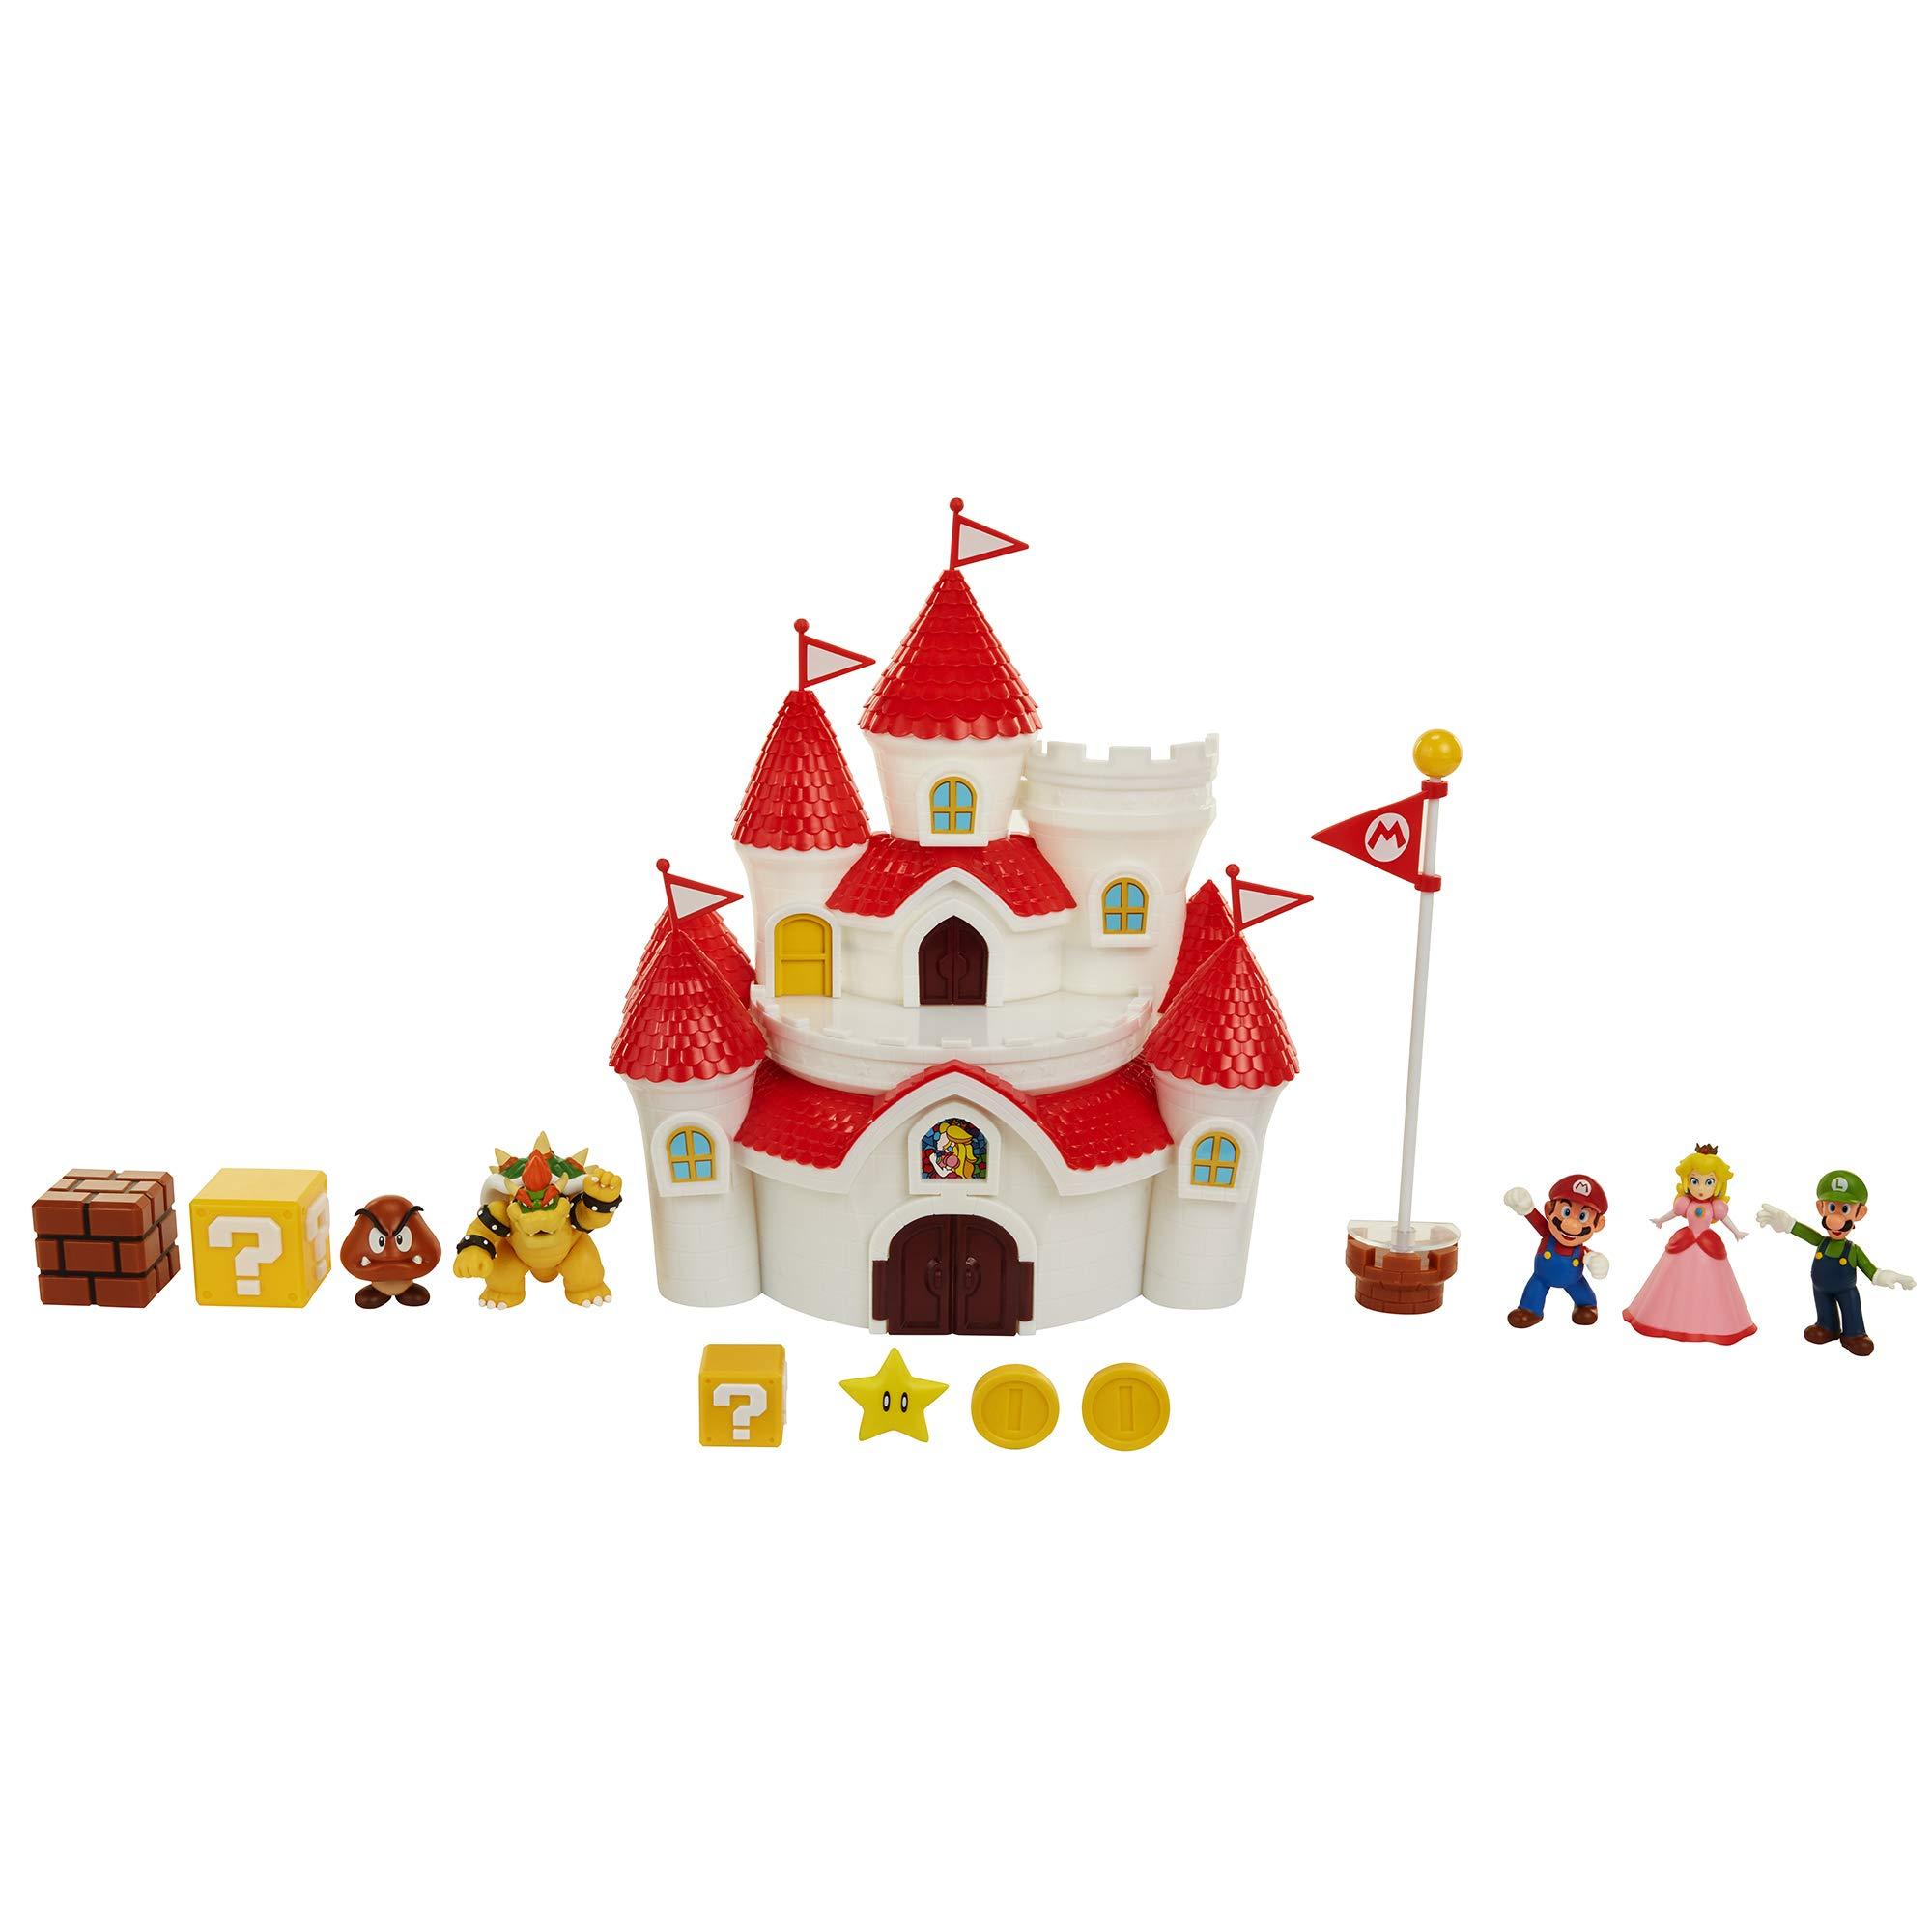 Nintendo Super Mario Deluxe Mushroom Kingdom Castle Playset with 5 Figures & 4 Accessories by Nintendo (Image #2)